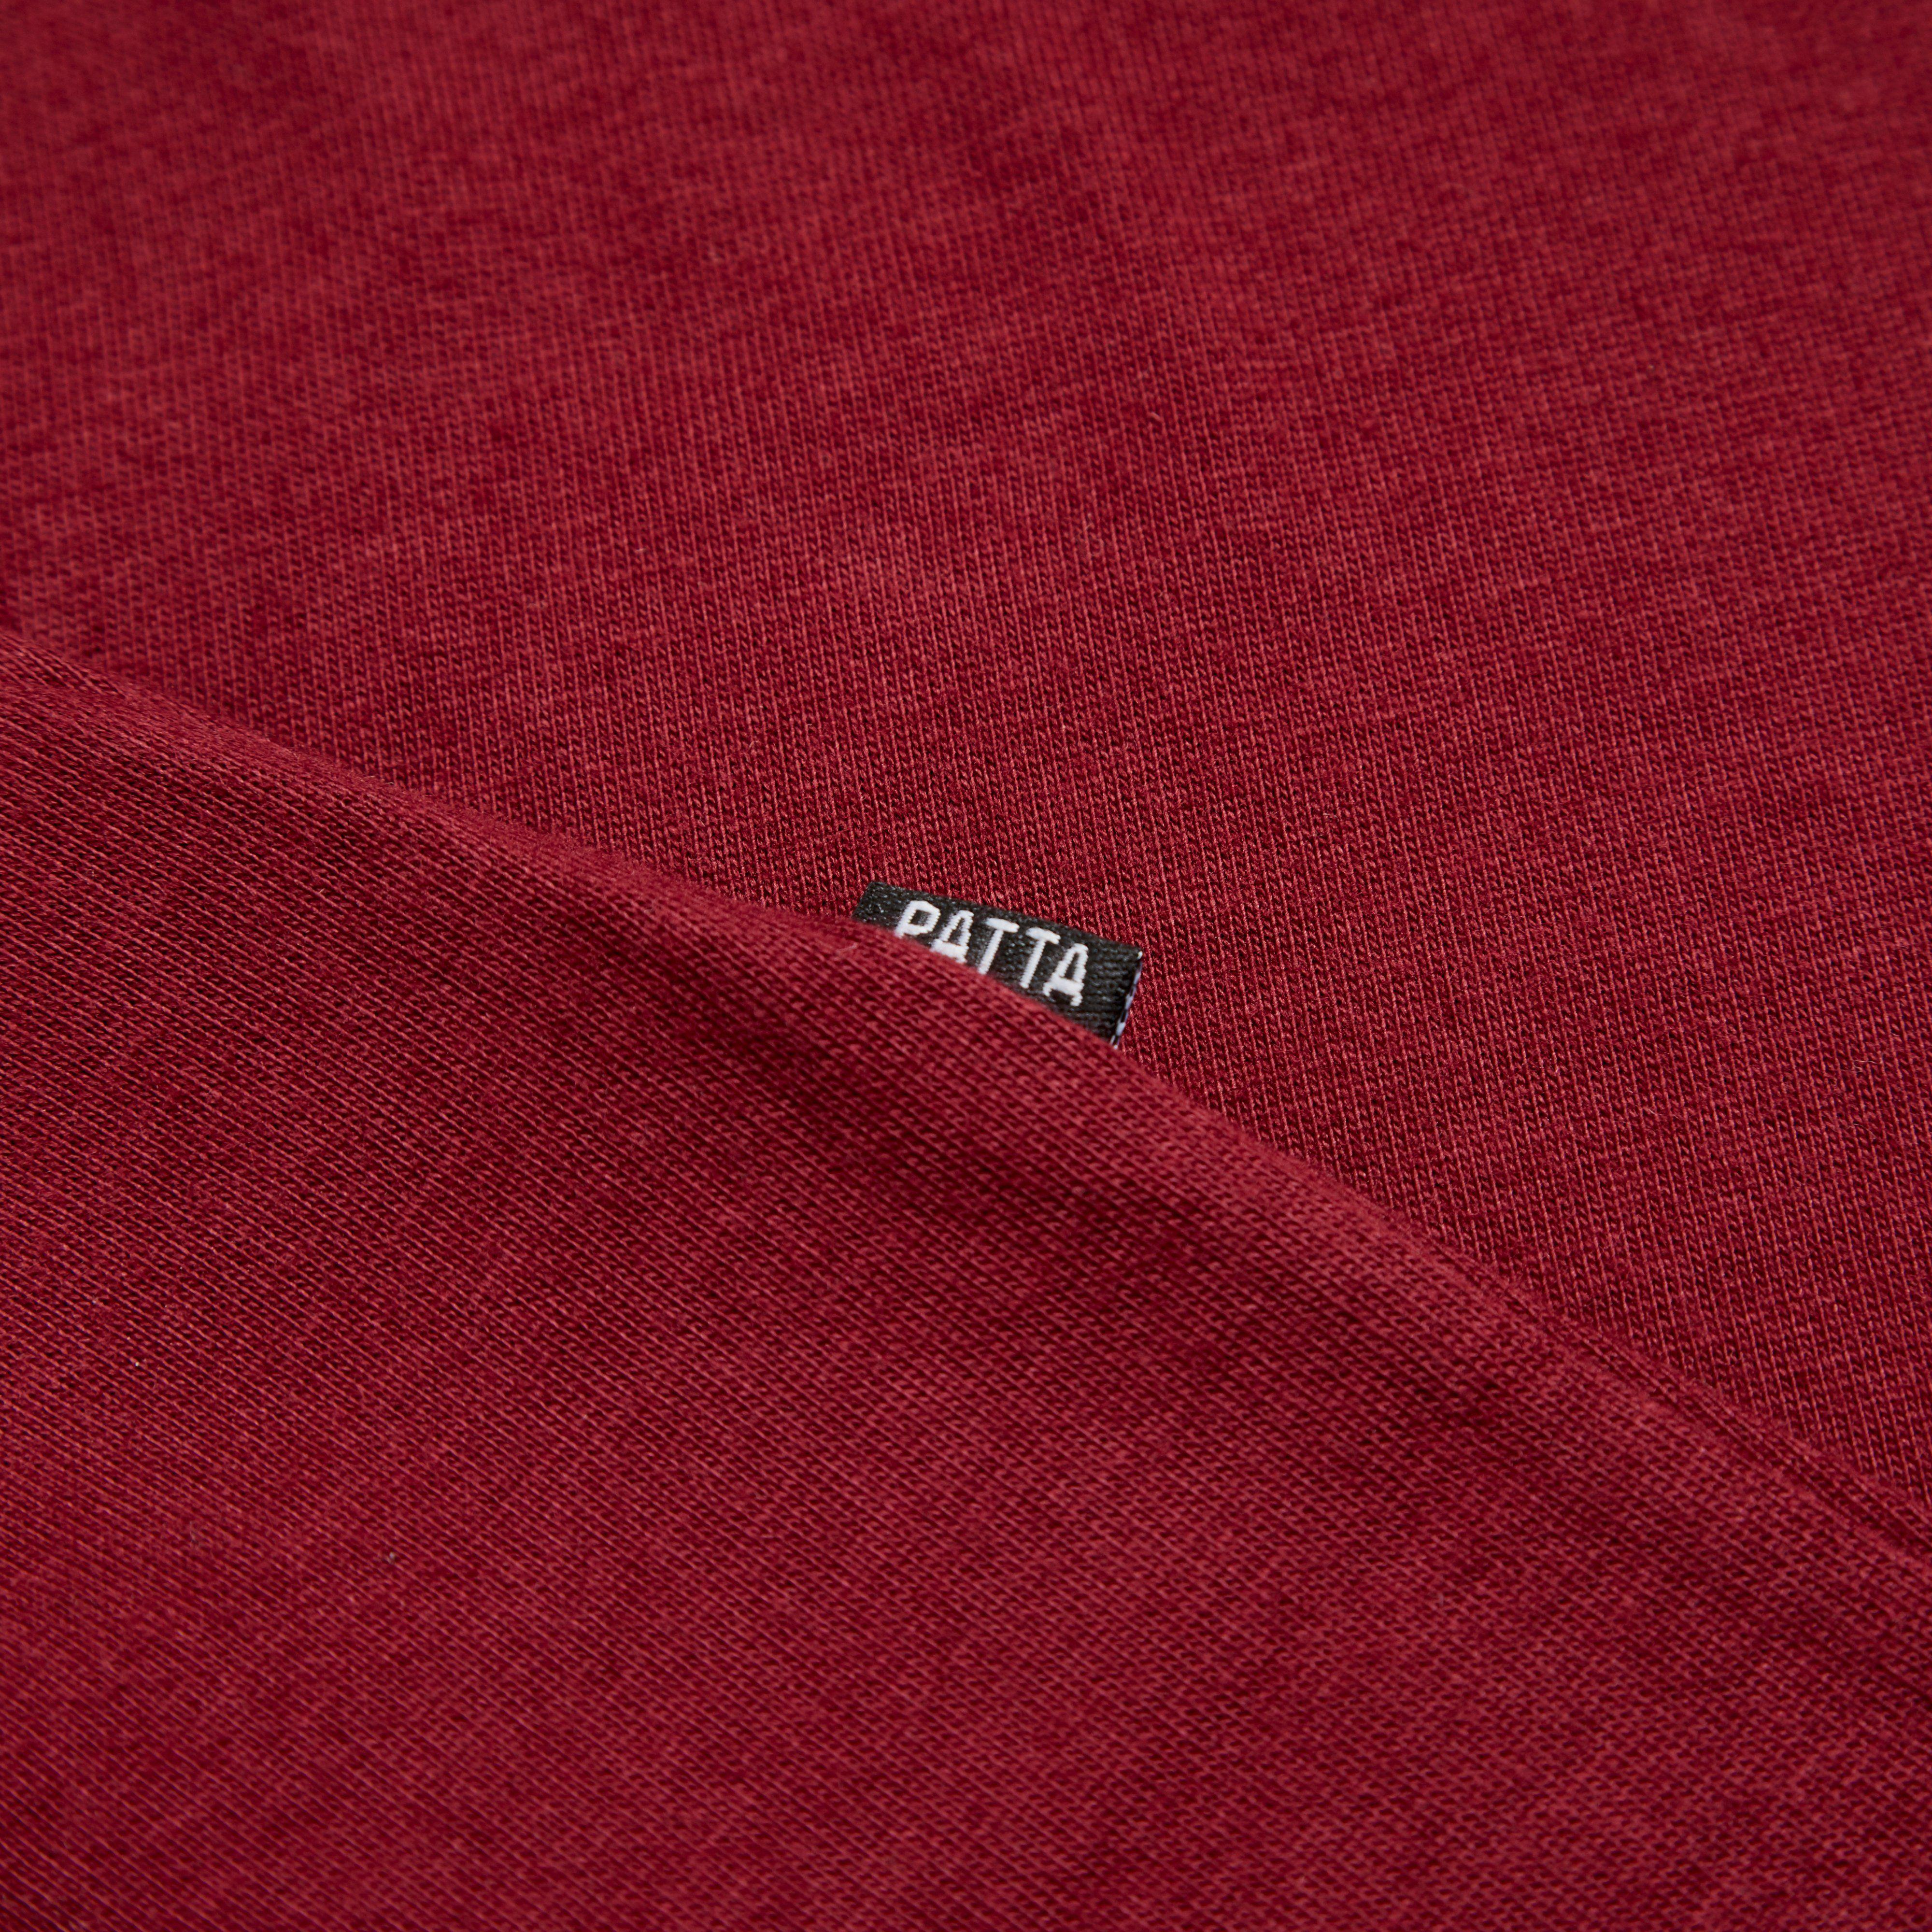 Patta Throwback T-shirt